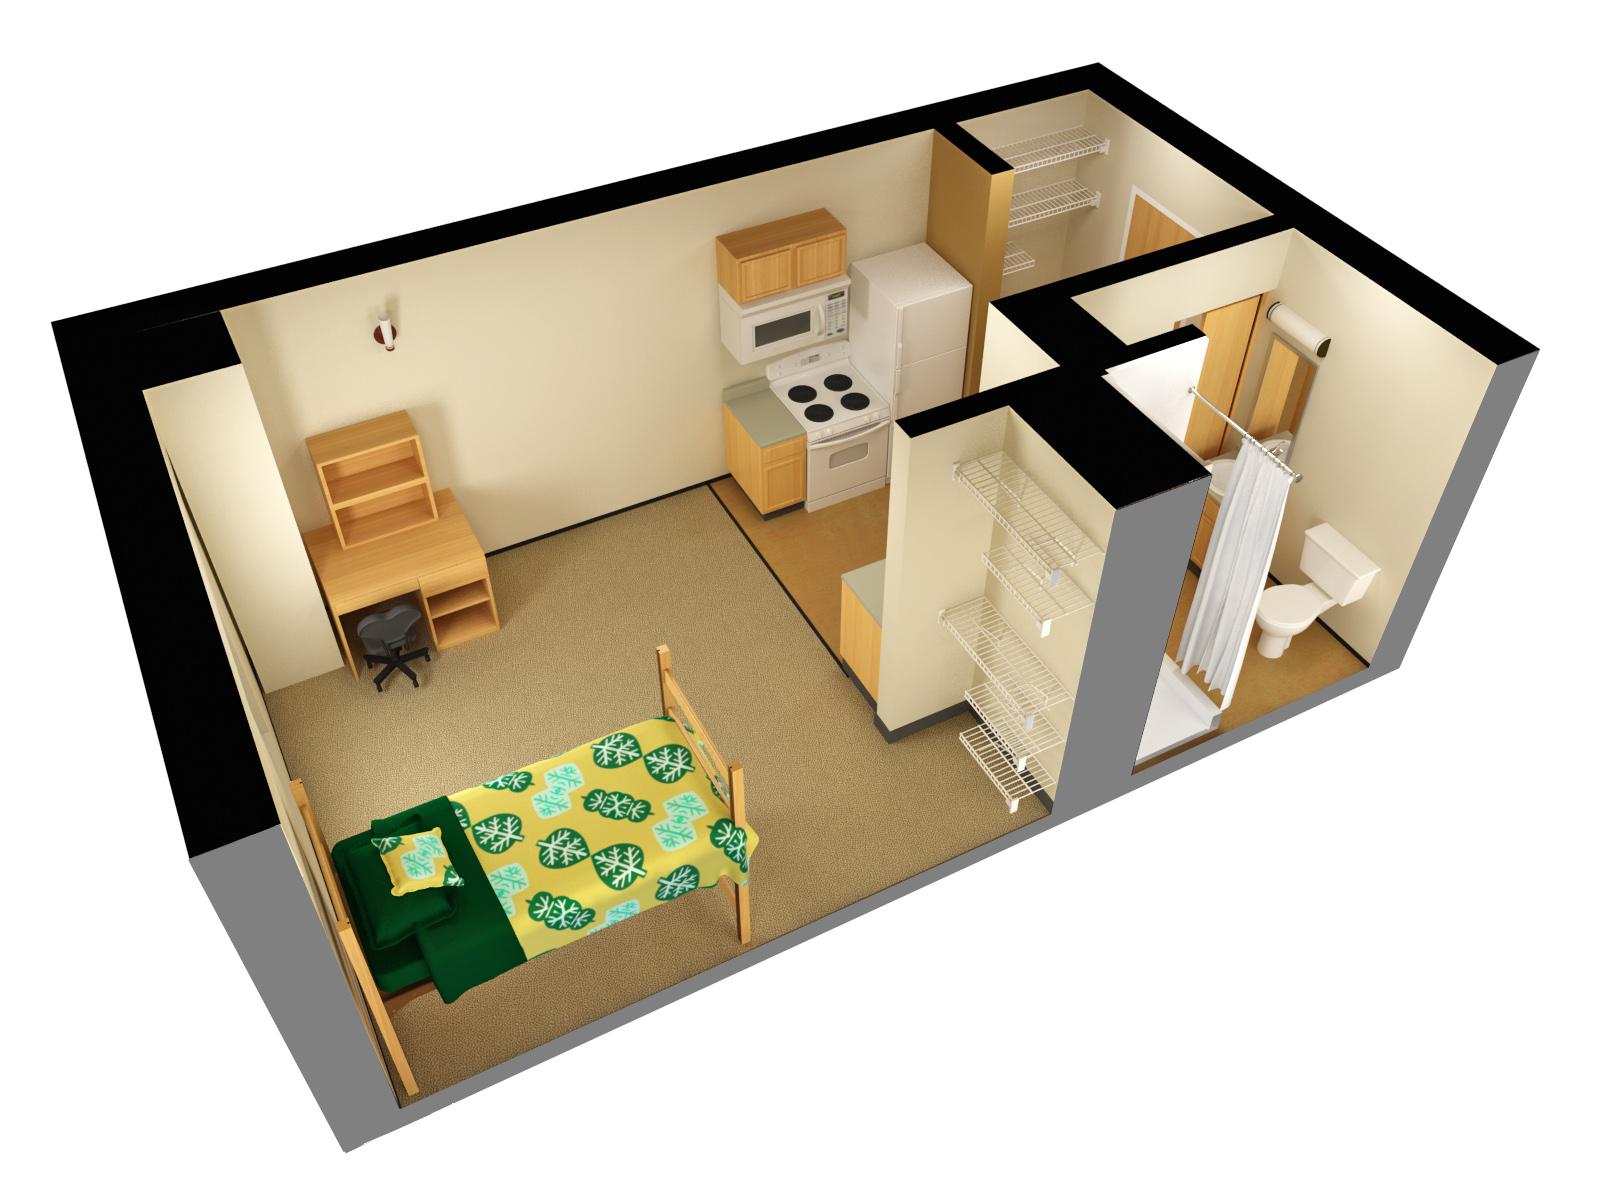 Mathew Living Learning Centers Residence Life Ndsu